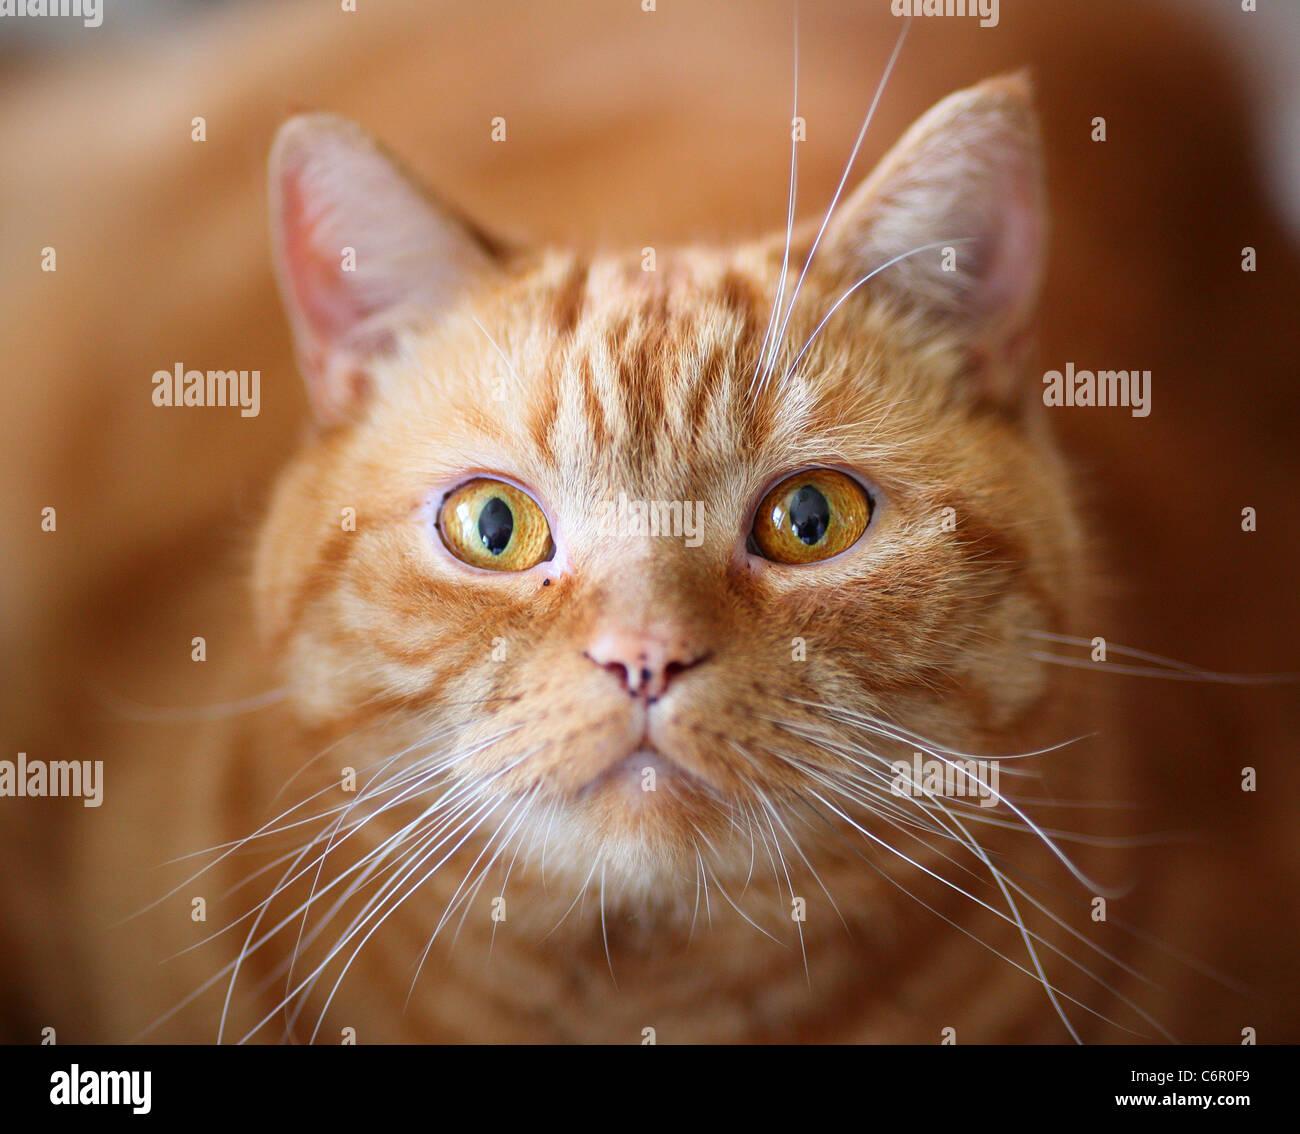 Ginger british shorthair cat  gazing gaze stare - Stock Image